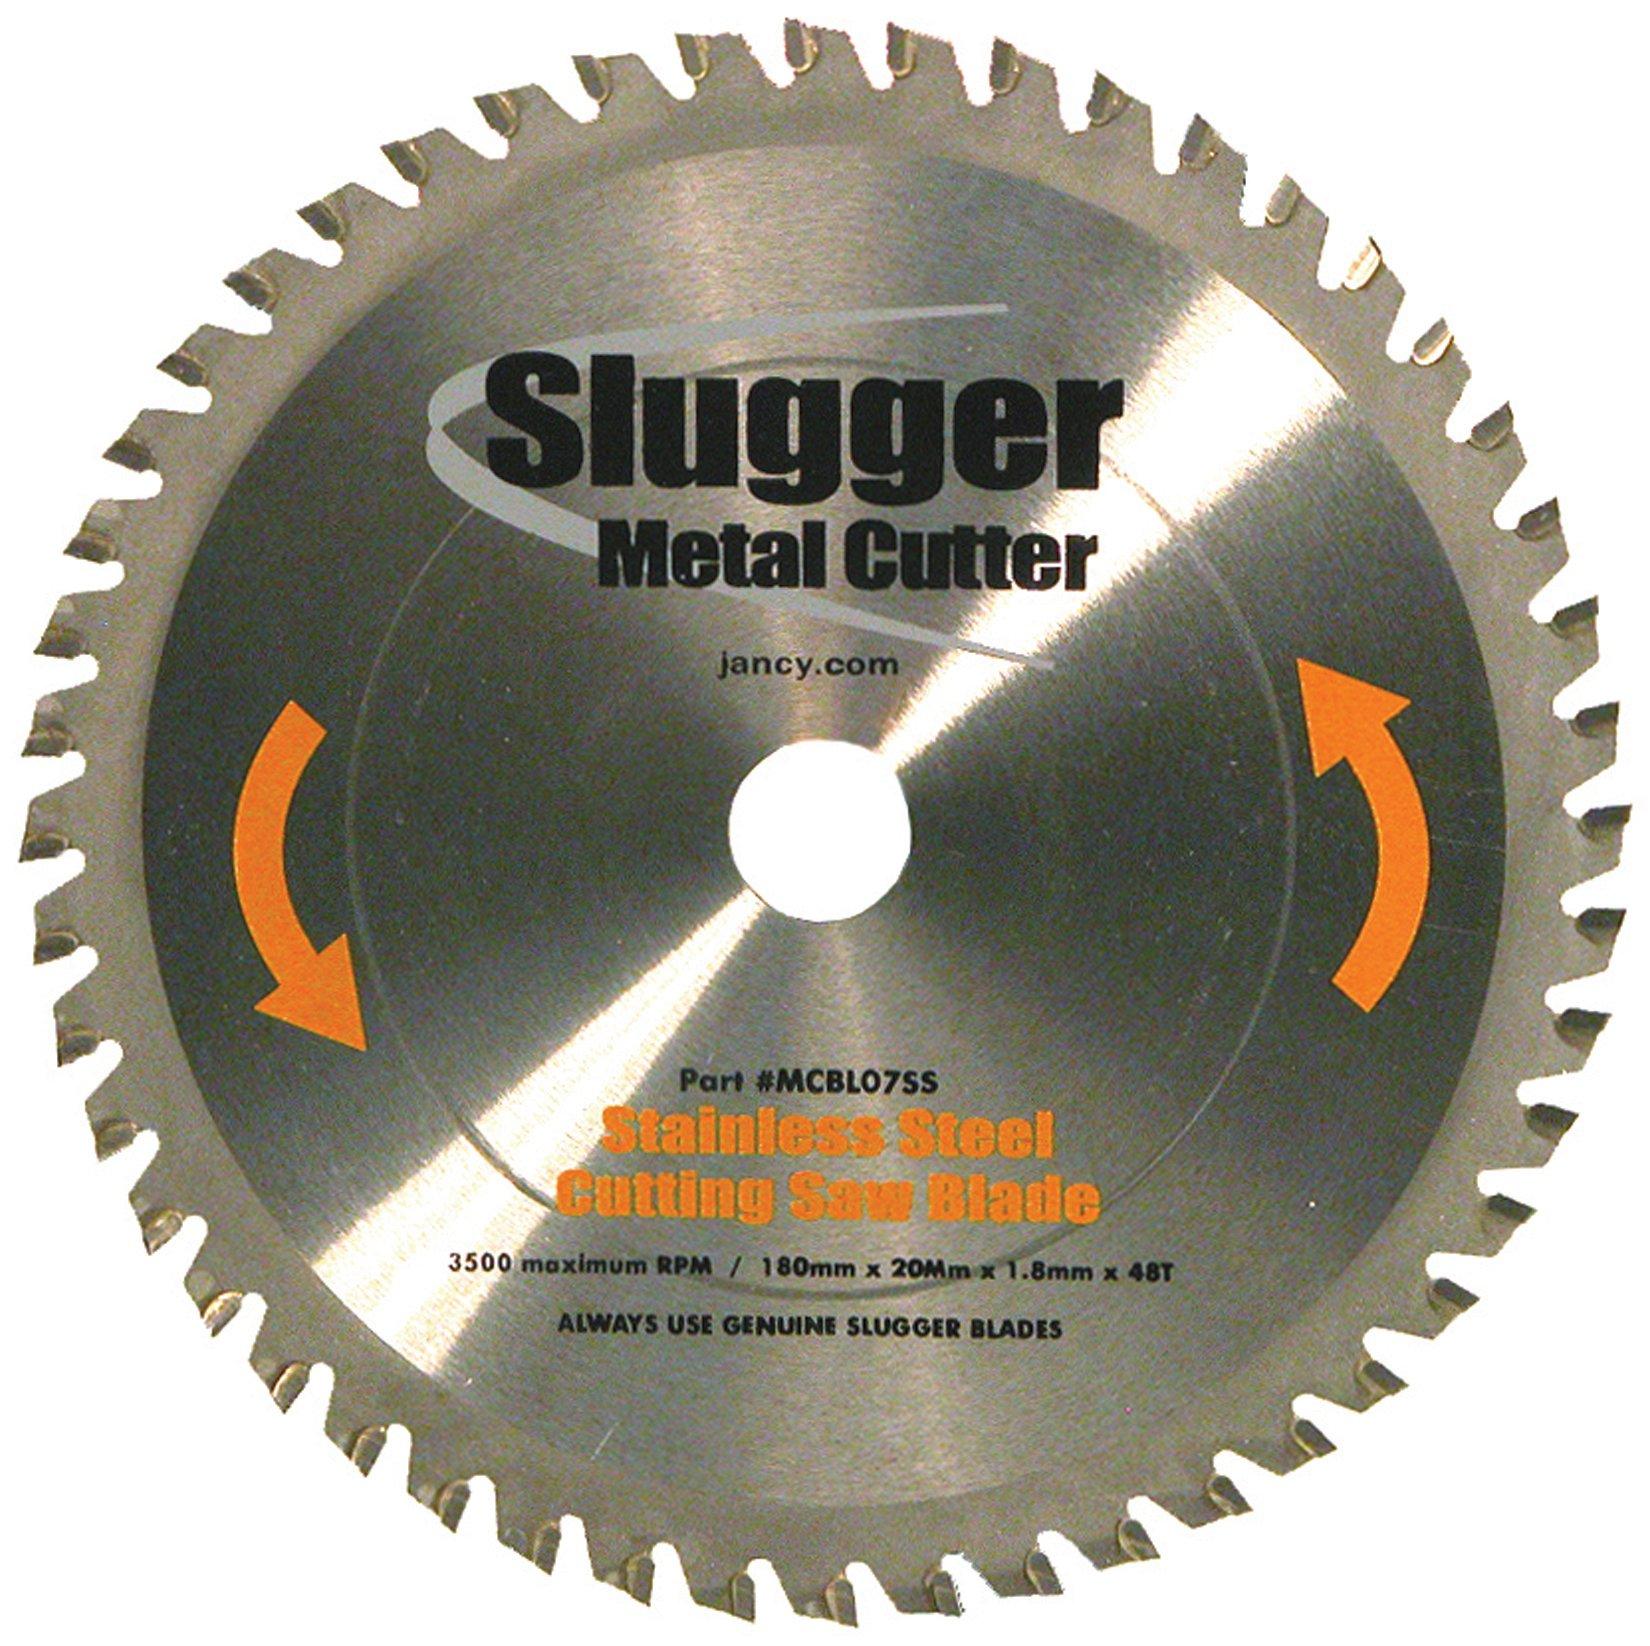 Jancy Slugger MCBLO7-SS Stainless Steel Cutting Saw Blade, 7'' Diameter, 48 Teeth